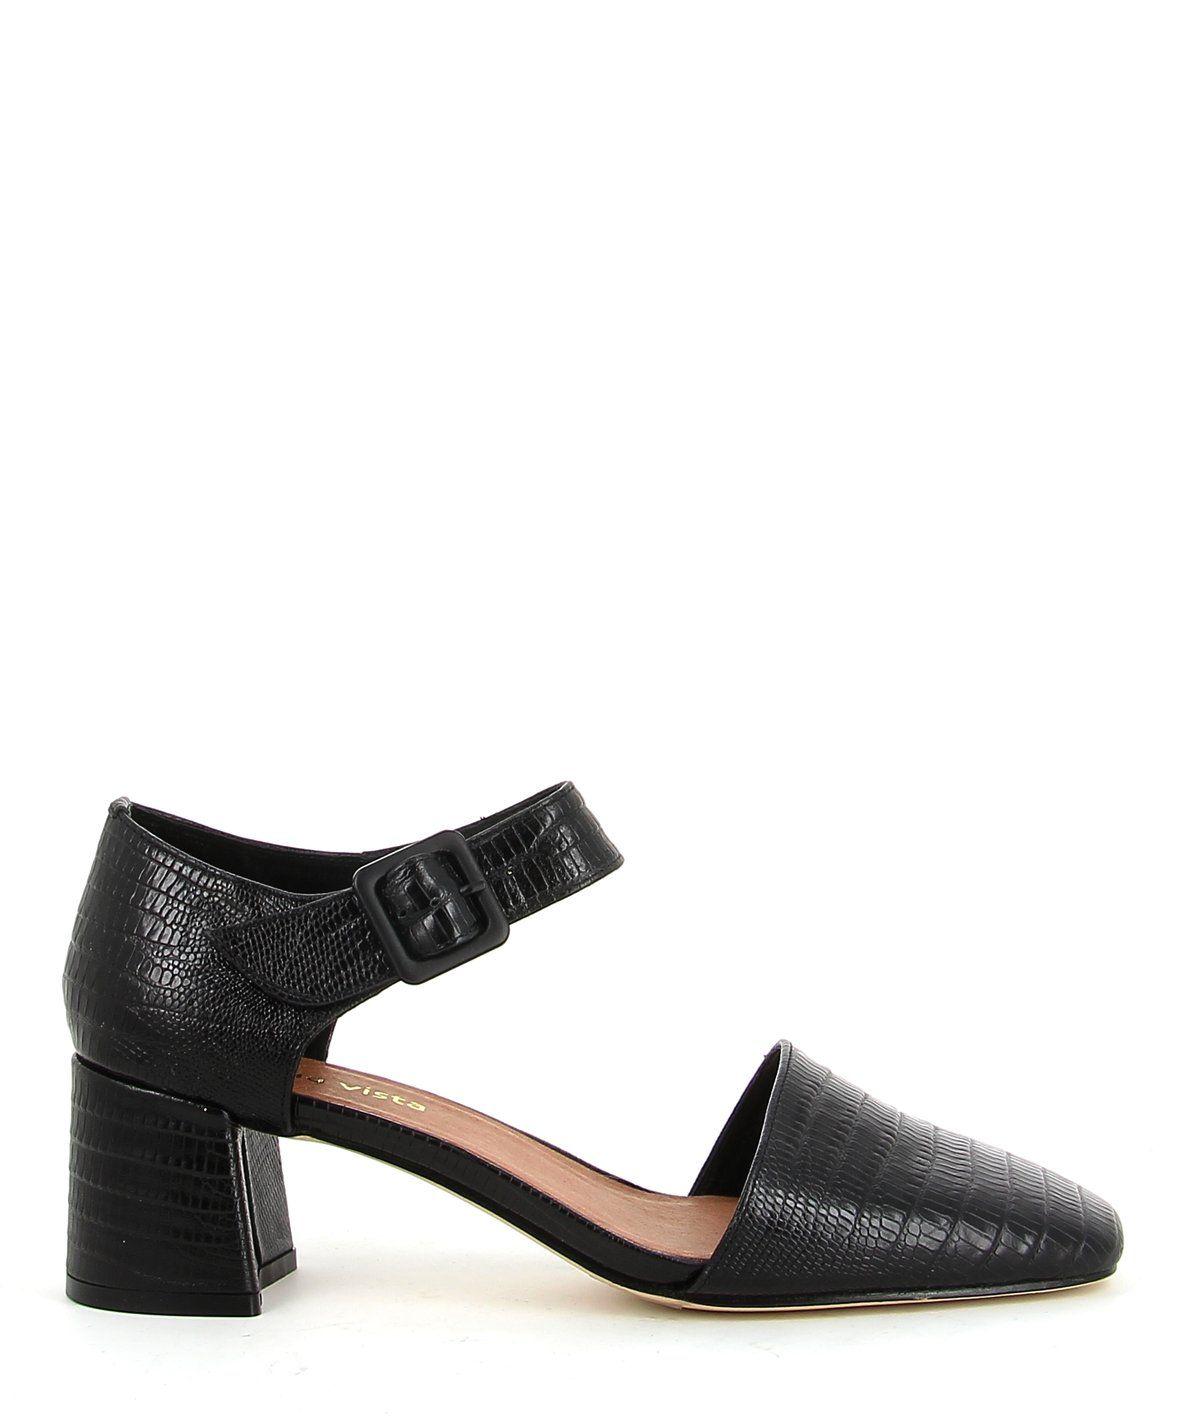 2 Baia Vista Quantic Black Suede Suede Black Suede Shoes